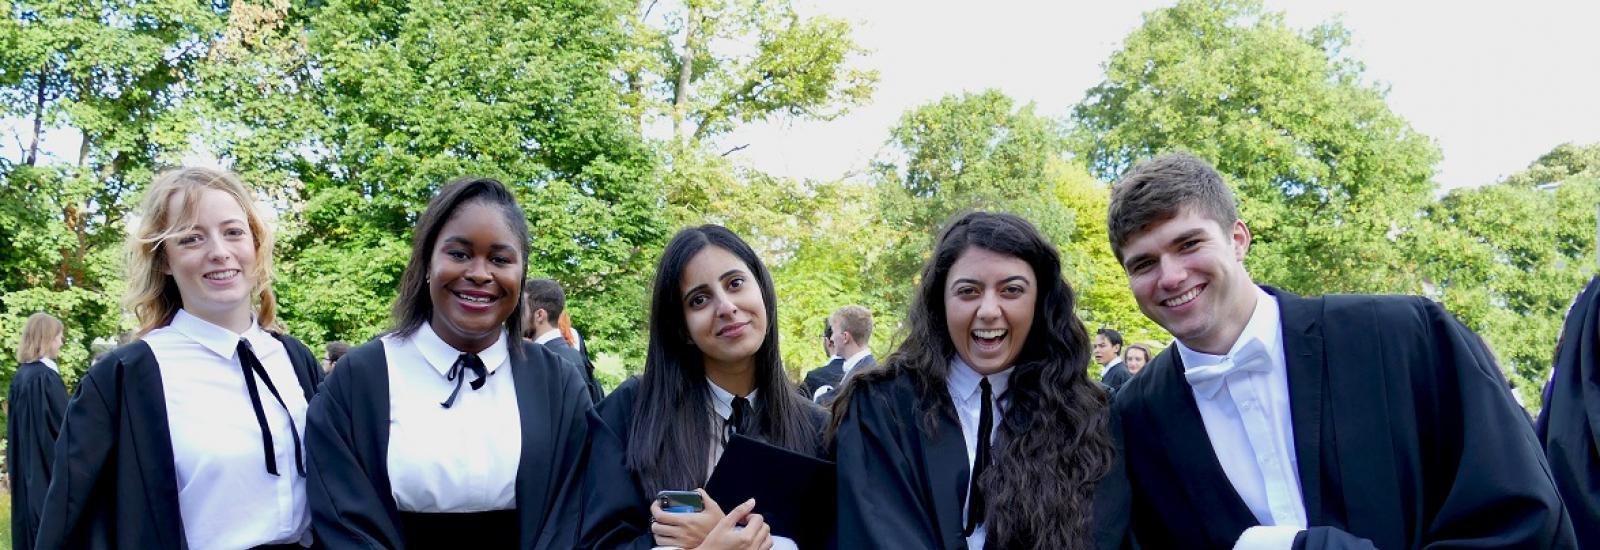 Graduation Day at St Hilda's College 28 September 2018